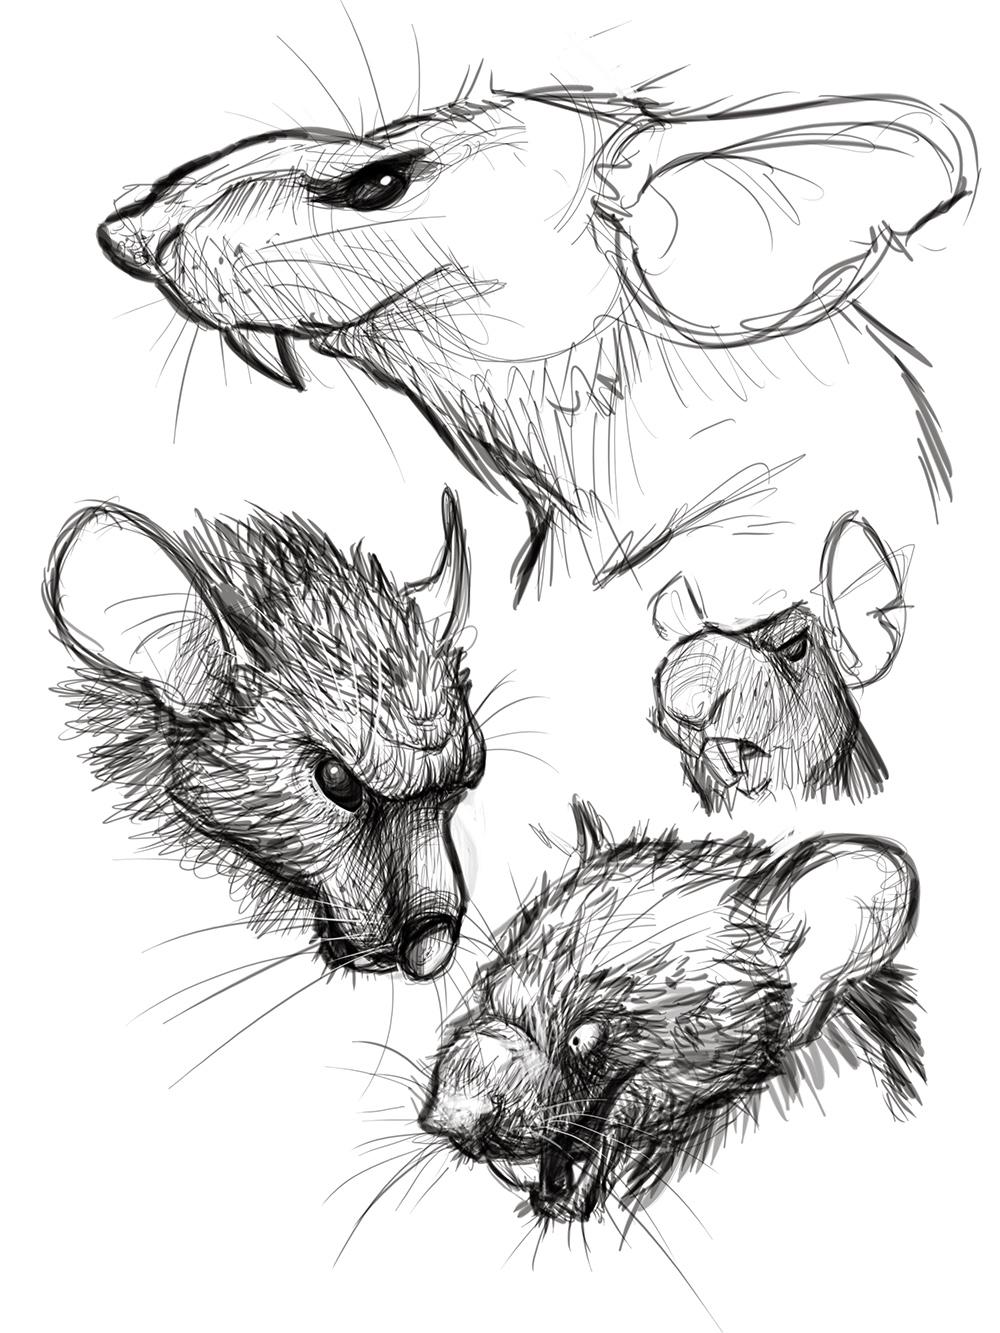 2014_08_14 - 04_rat_sketch.jpg